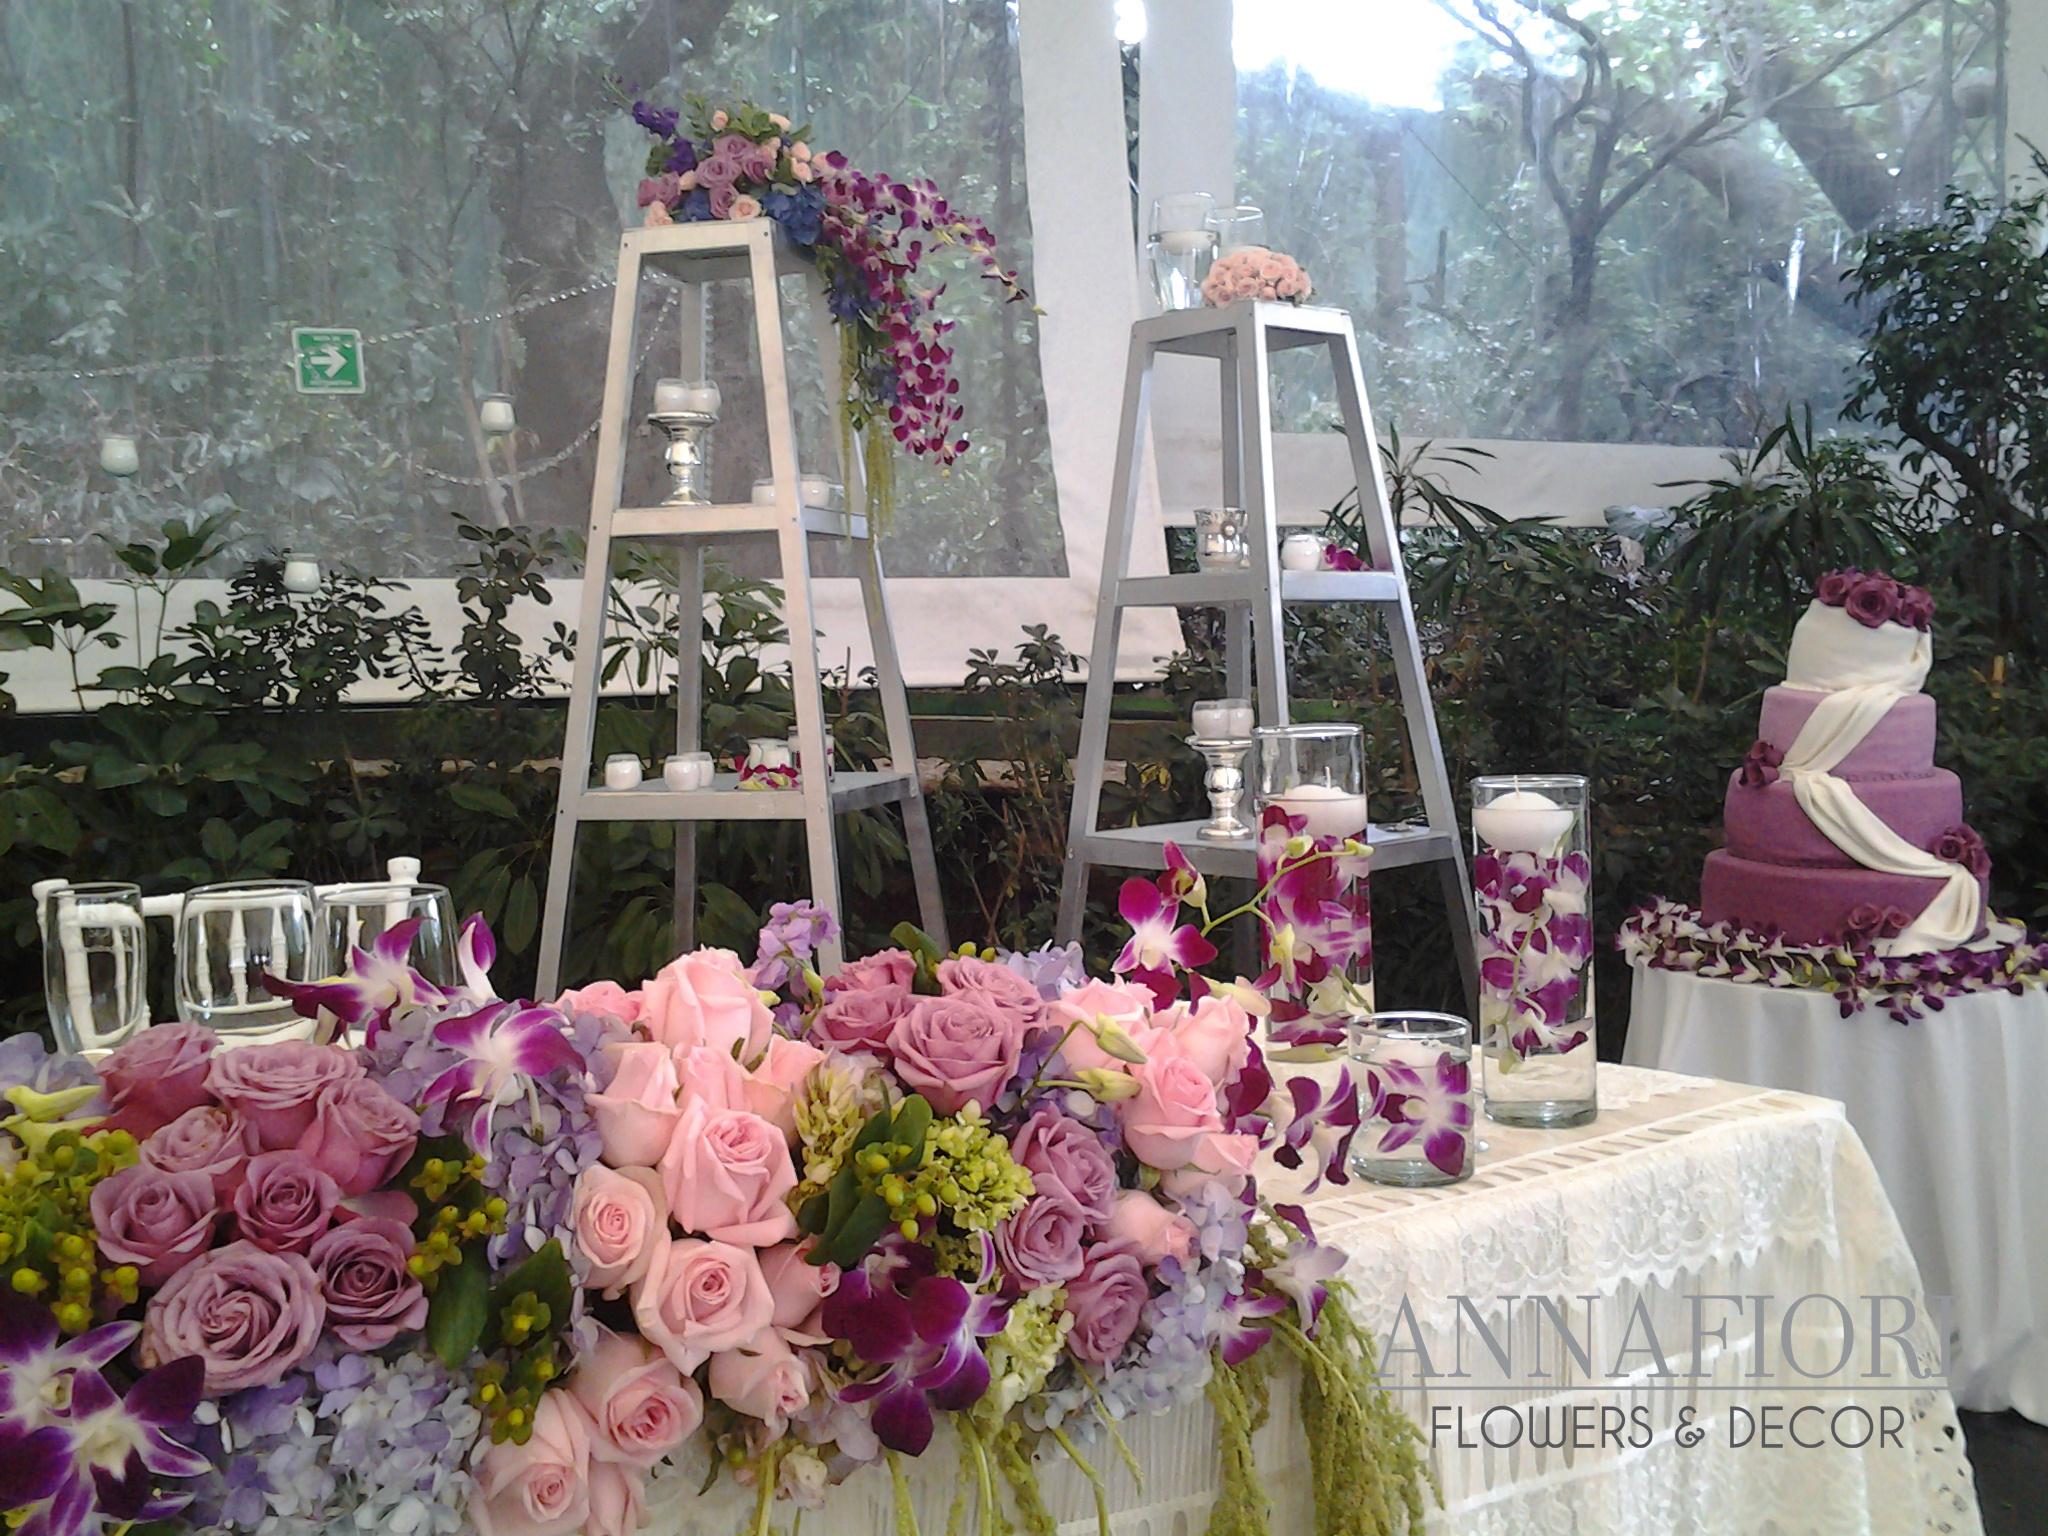 Eventos by Annafiori decoración de boda en tonos rosa